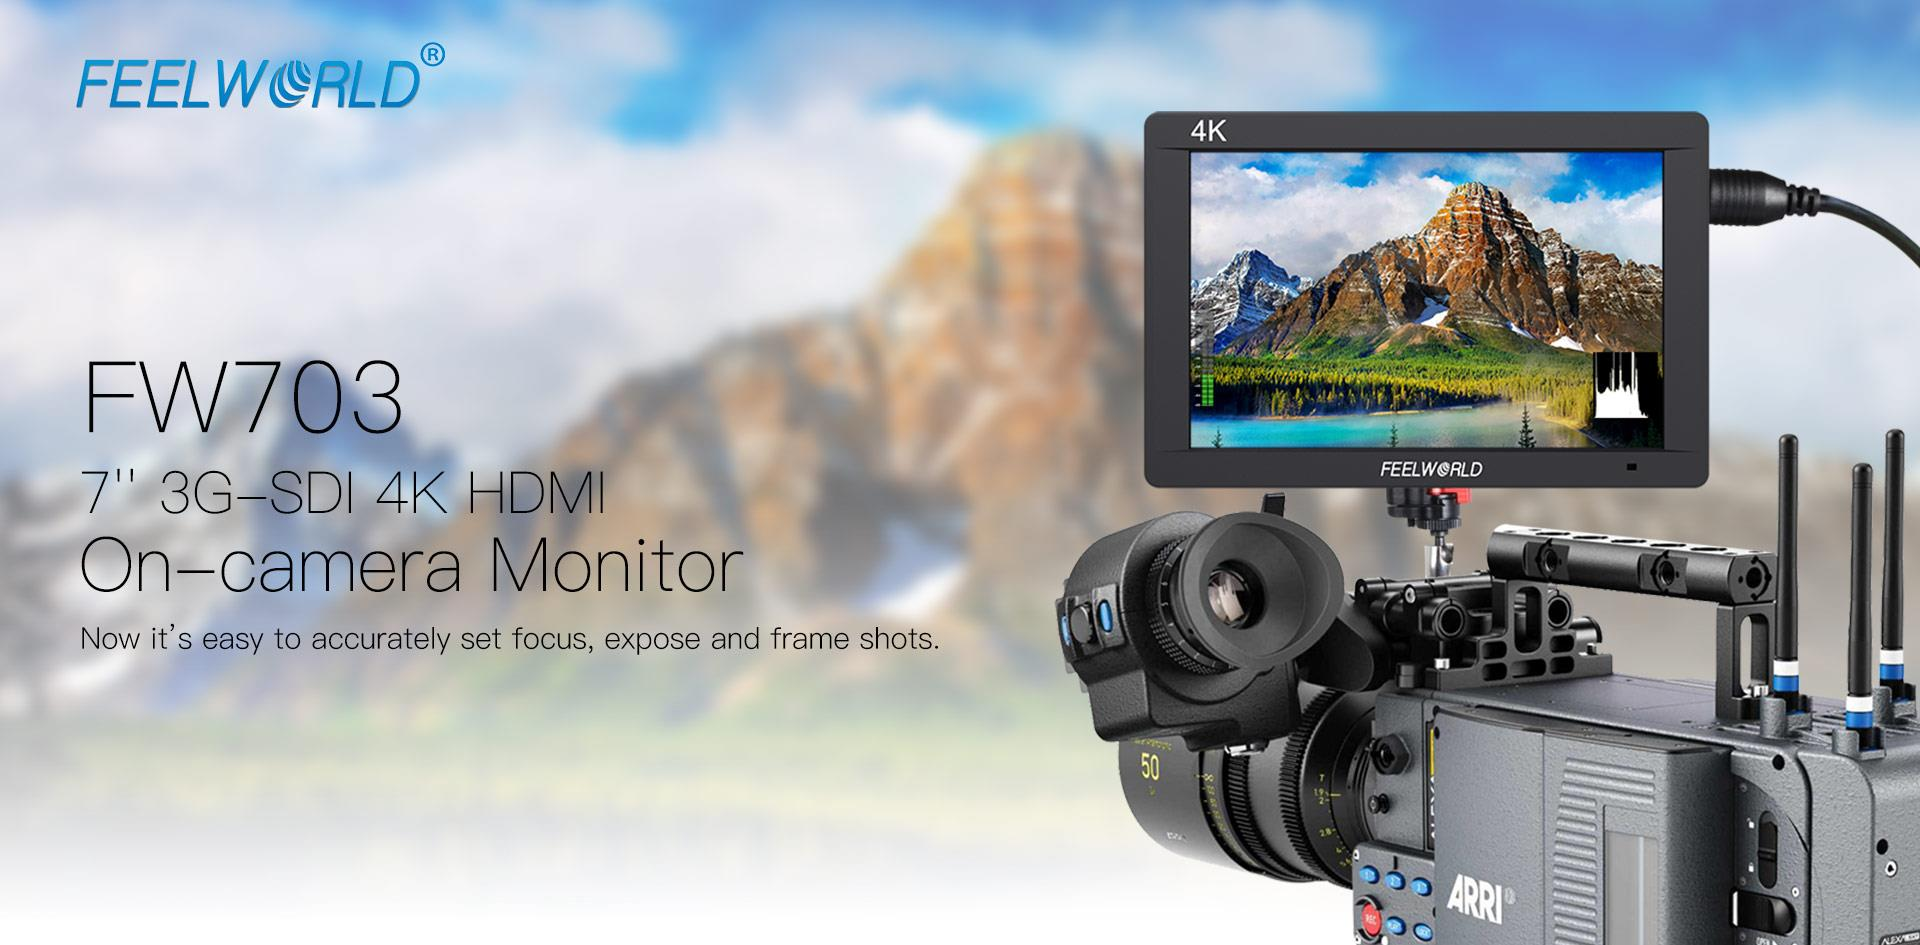 Monitor 4K HDMI IPS 7 inch 3G-SDI FW703 Feelworld